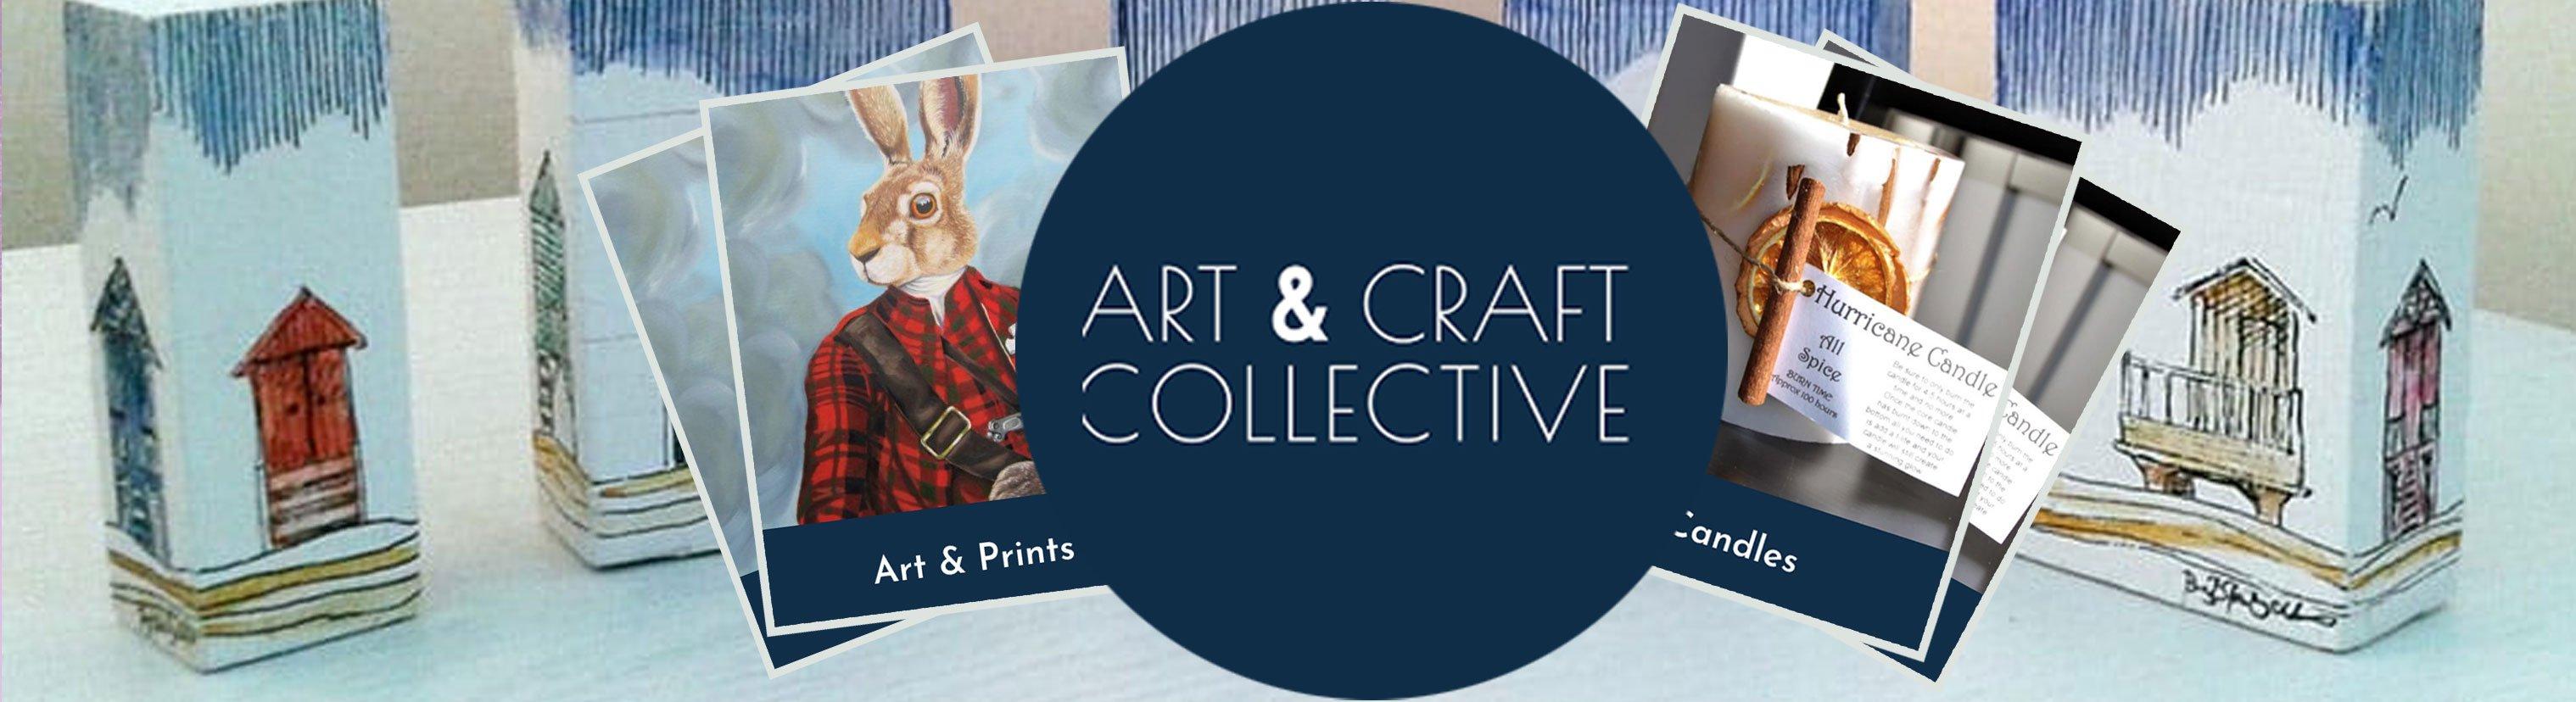 Art craft collective